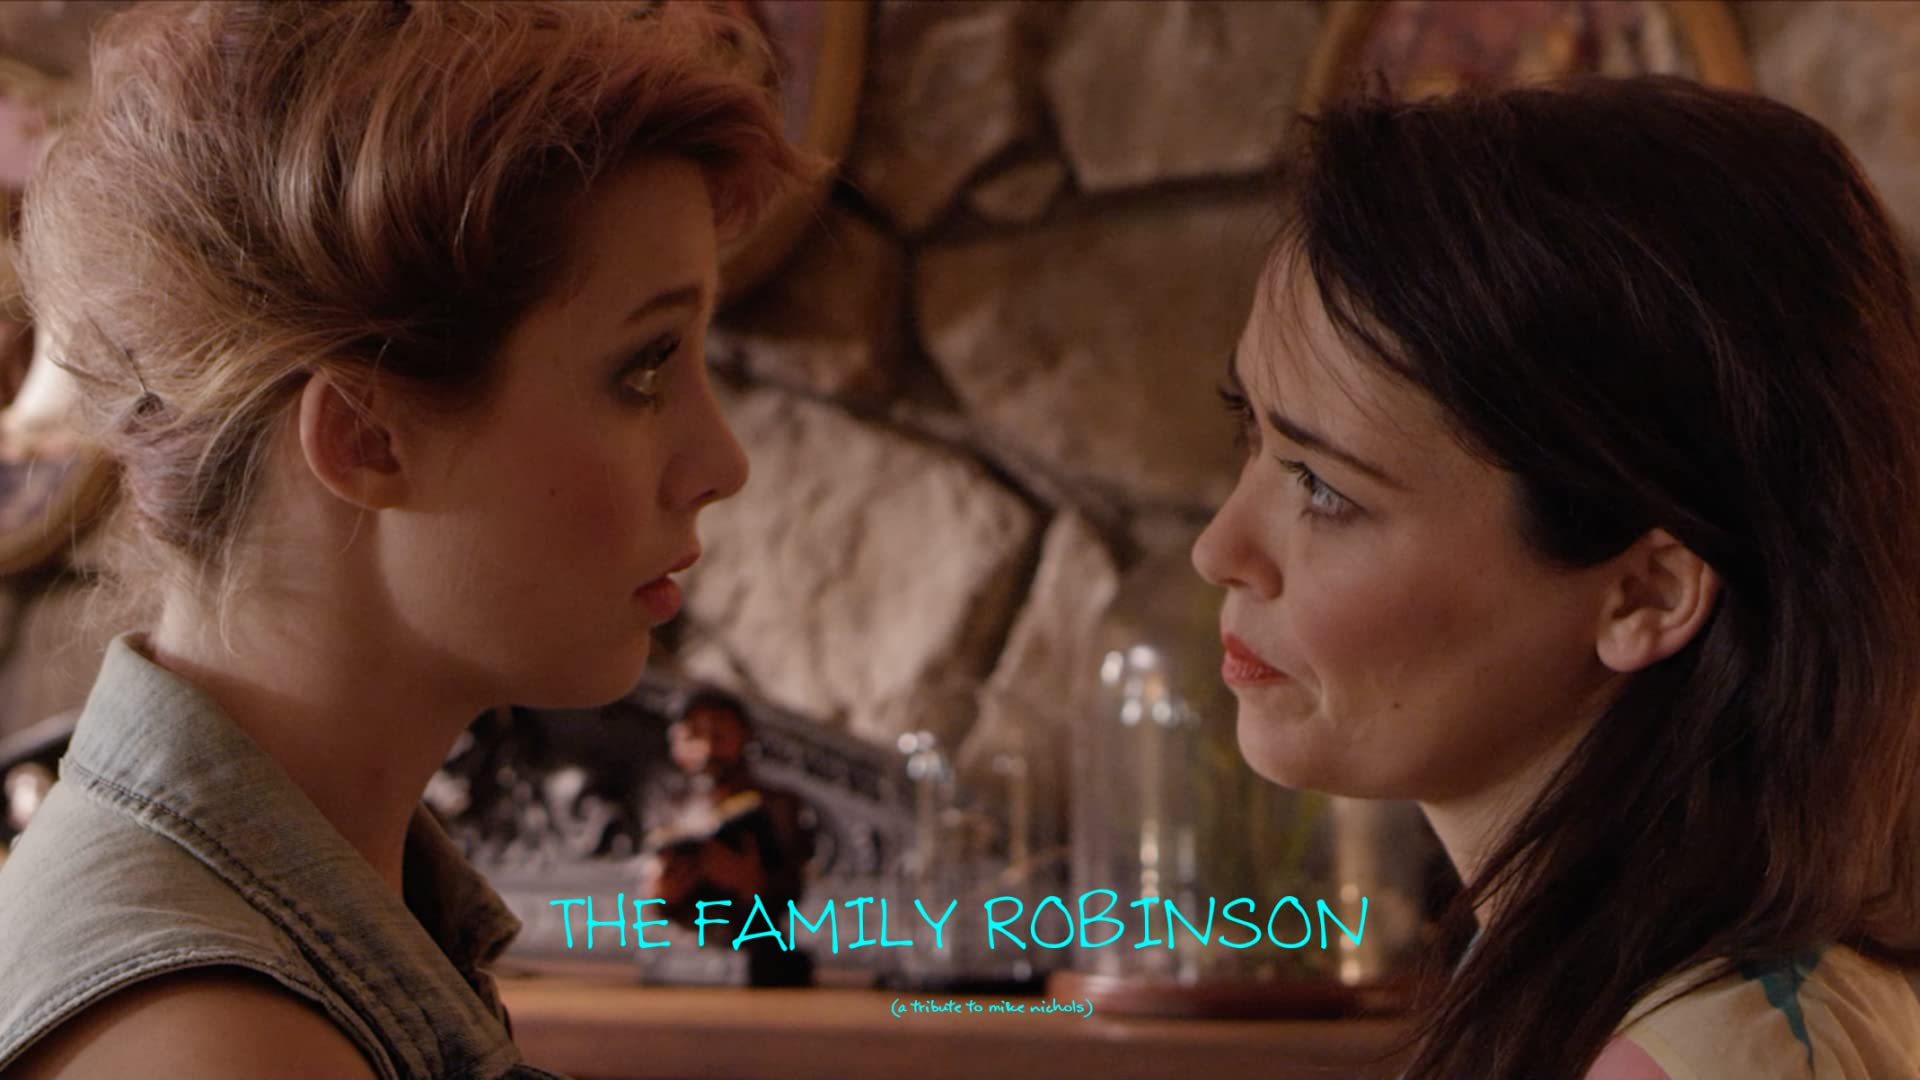 The Family Robinson